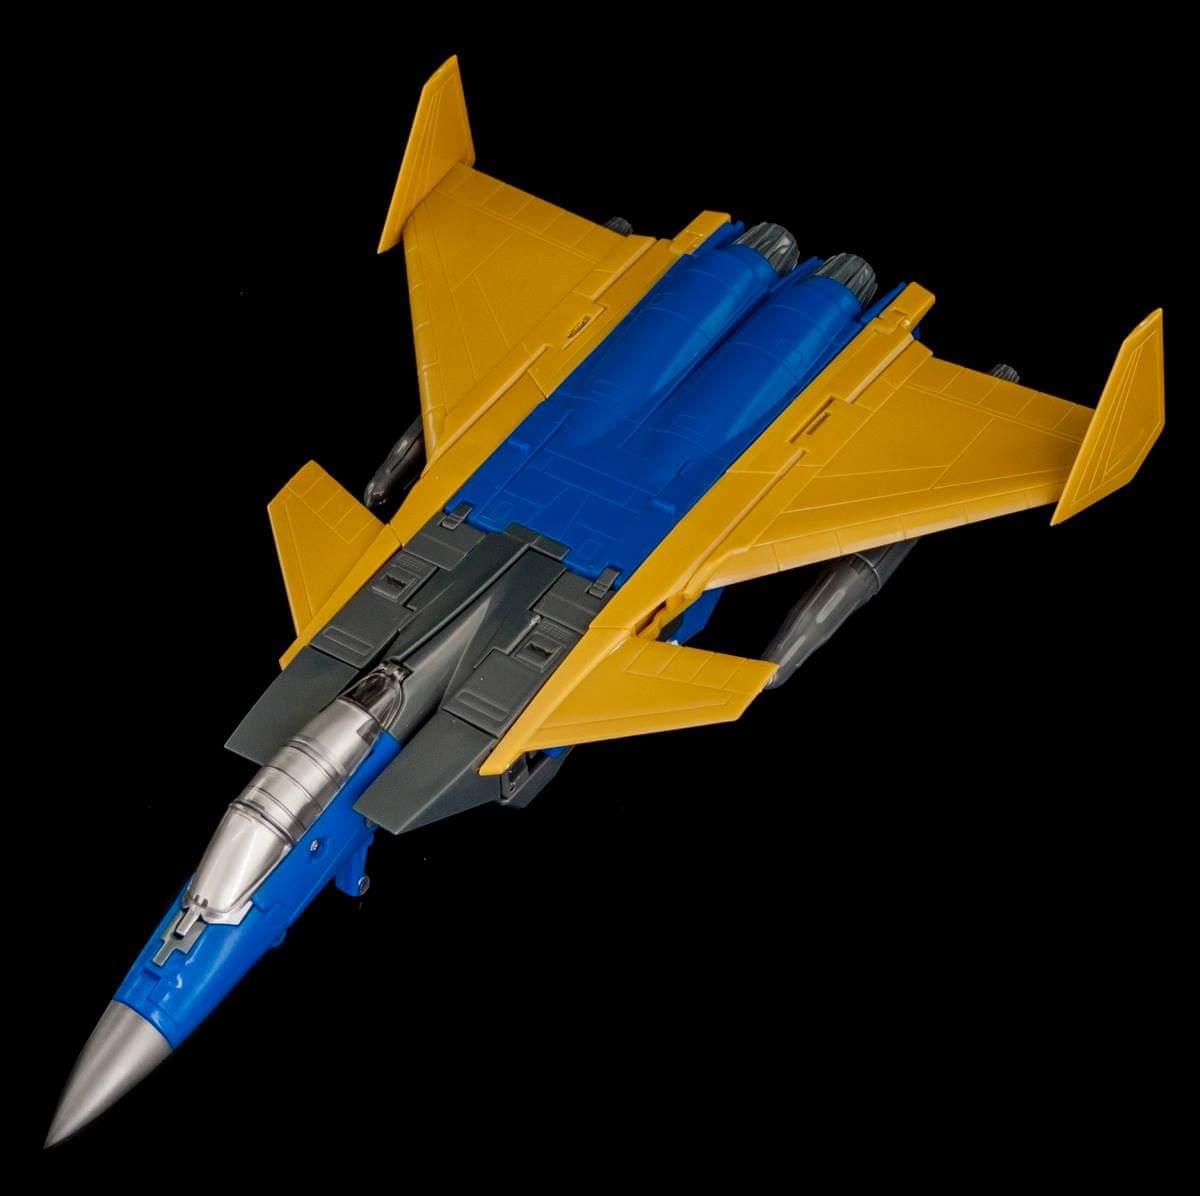 [Maketoys] Produit Tiers - Jouets MTRM-15 Endgame (aka Dirge/Funébro), MTRM-16 Jetstream (aka Thrust/Fatalo) & MTRM-17 Booster (aka Ramjet/Statoréacto) QpUleFiI_o